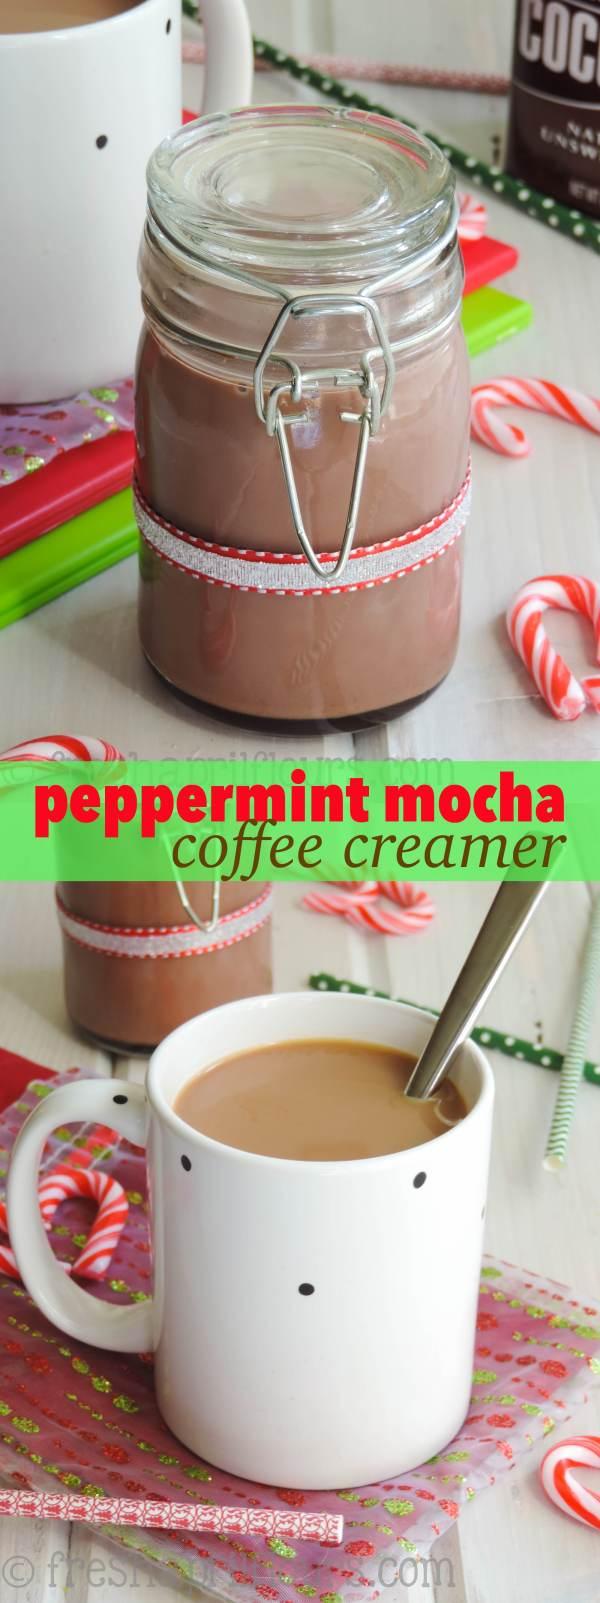 Peppermint Mocha Coffee Creamer